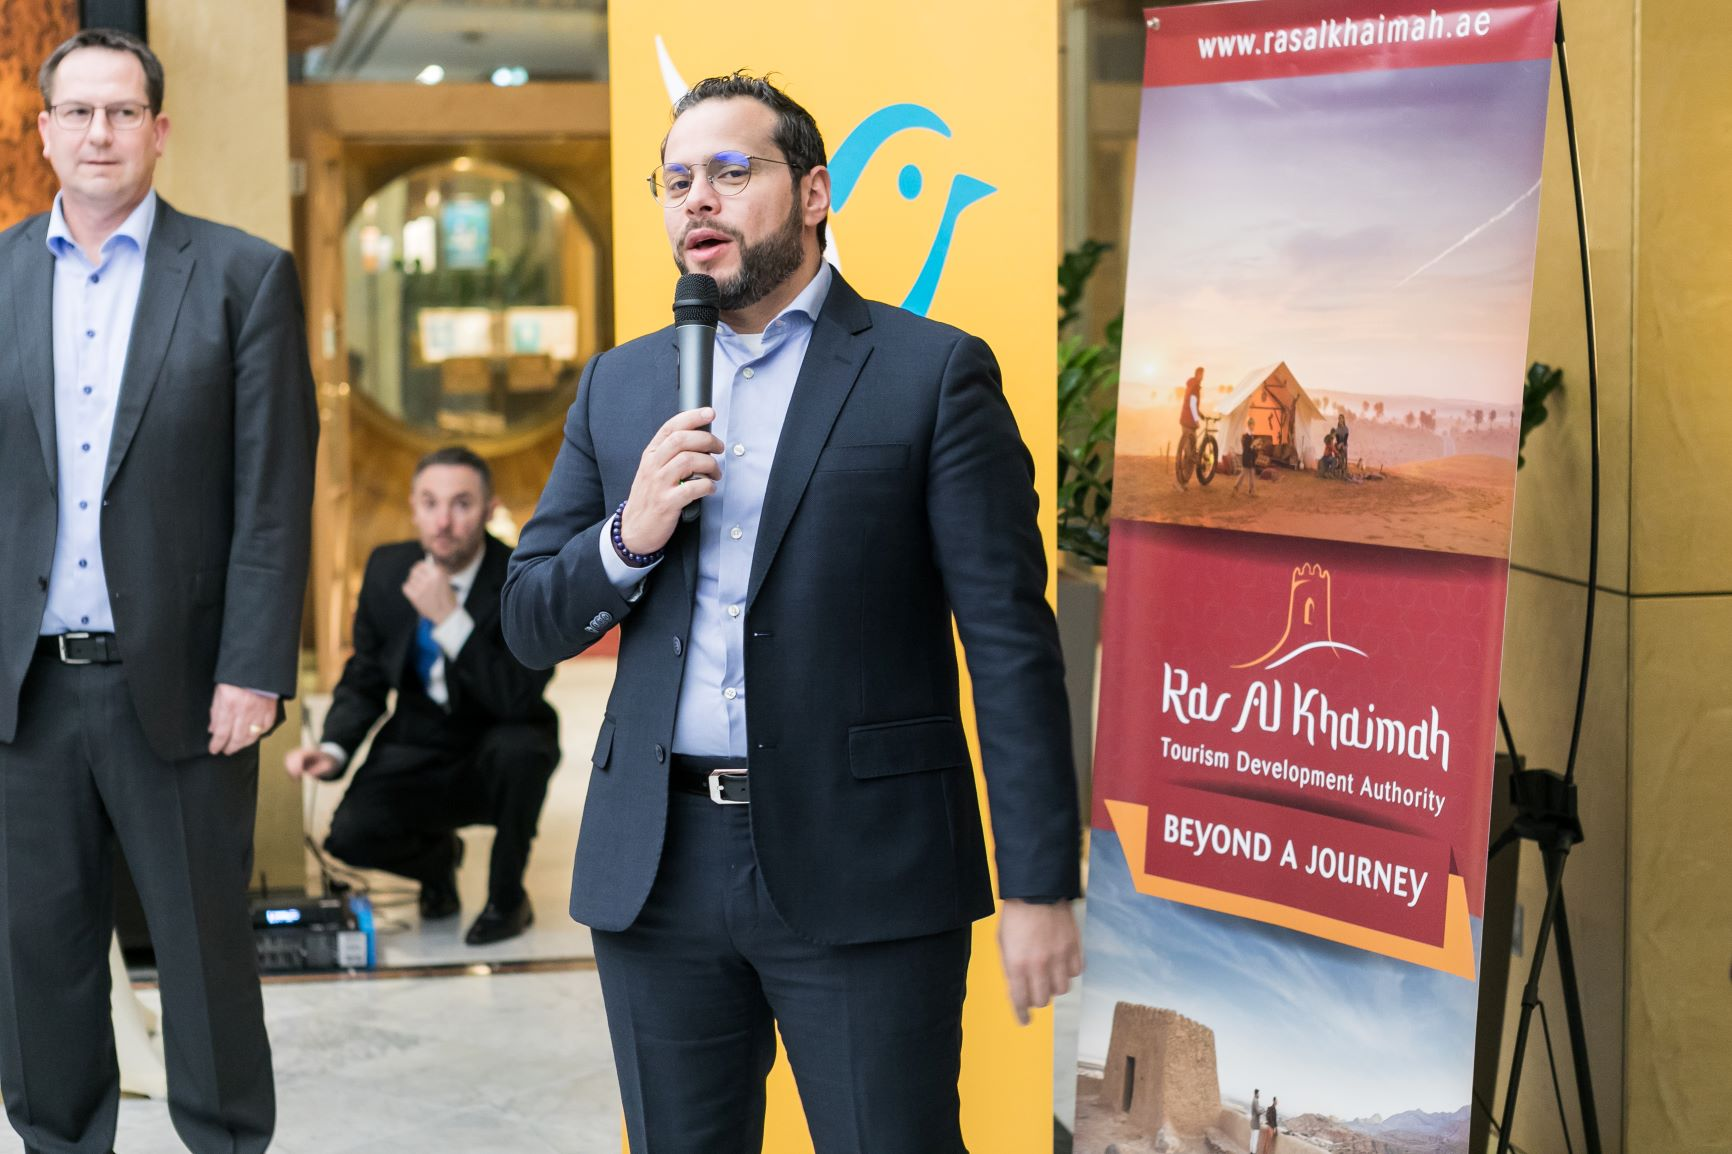 Mohamed Khater, Ras Al Khaimah Tourism Development Authority, UAE